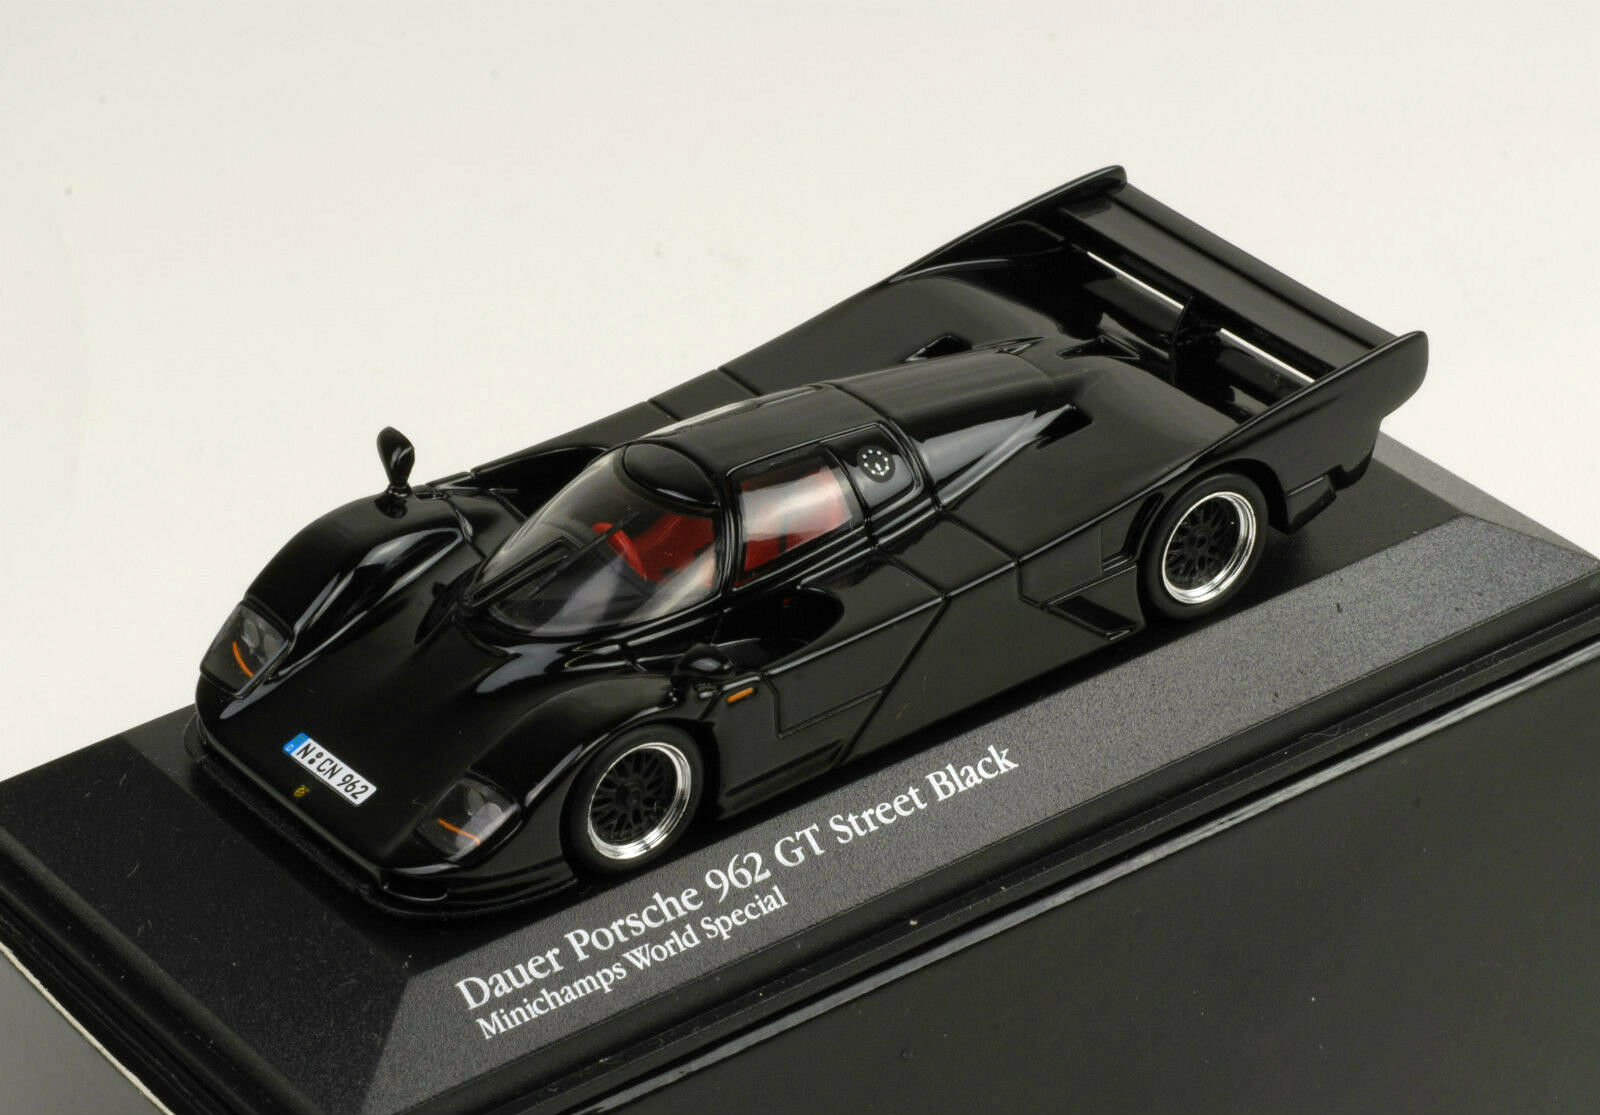 nueva marca Minichamps 1 43 43 43 Porsche 962 GT Street negro (Minichamps World Special)  promociones